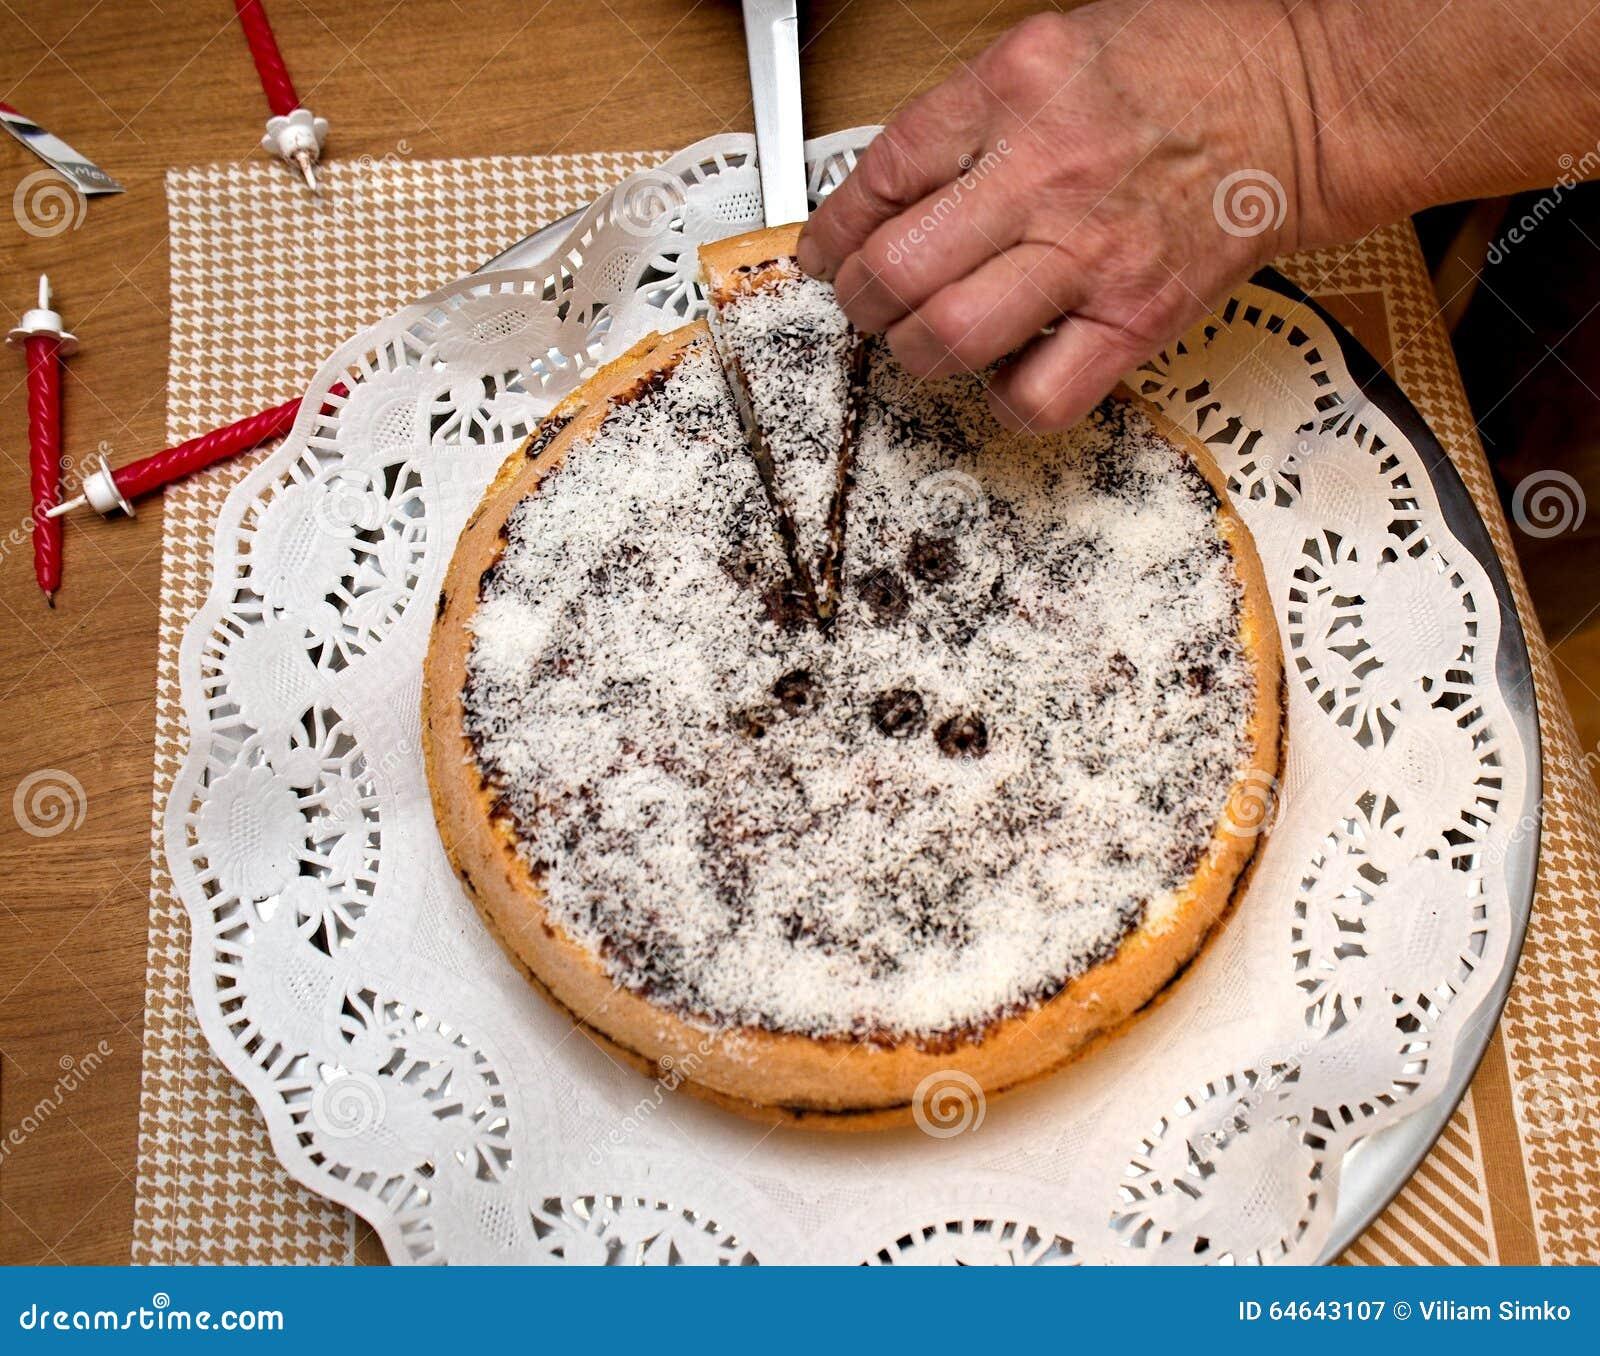 Astounding Birthday Cake From Grandma Stock Image Image Of Board 64643107 Personalised Birthday Cards Bromeletsinfo